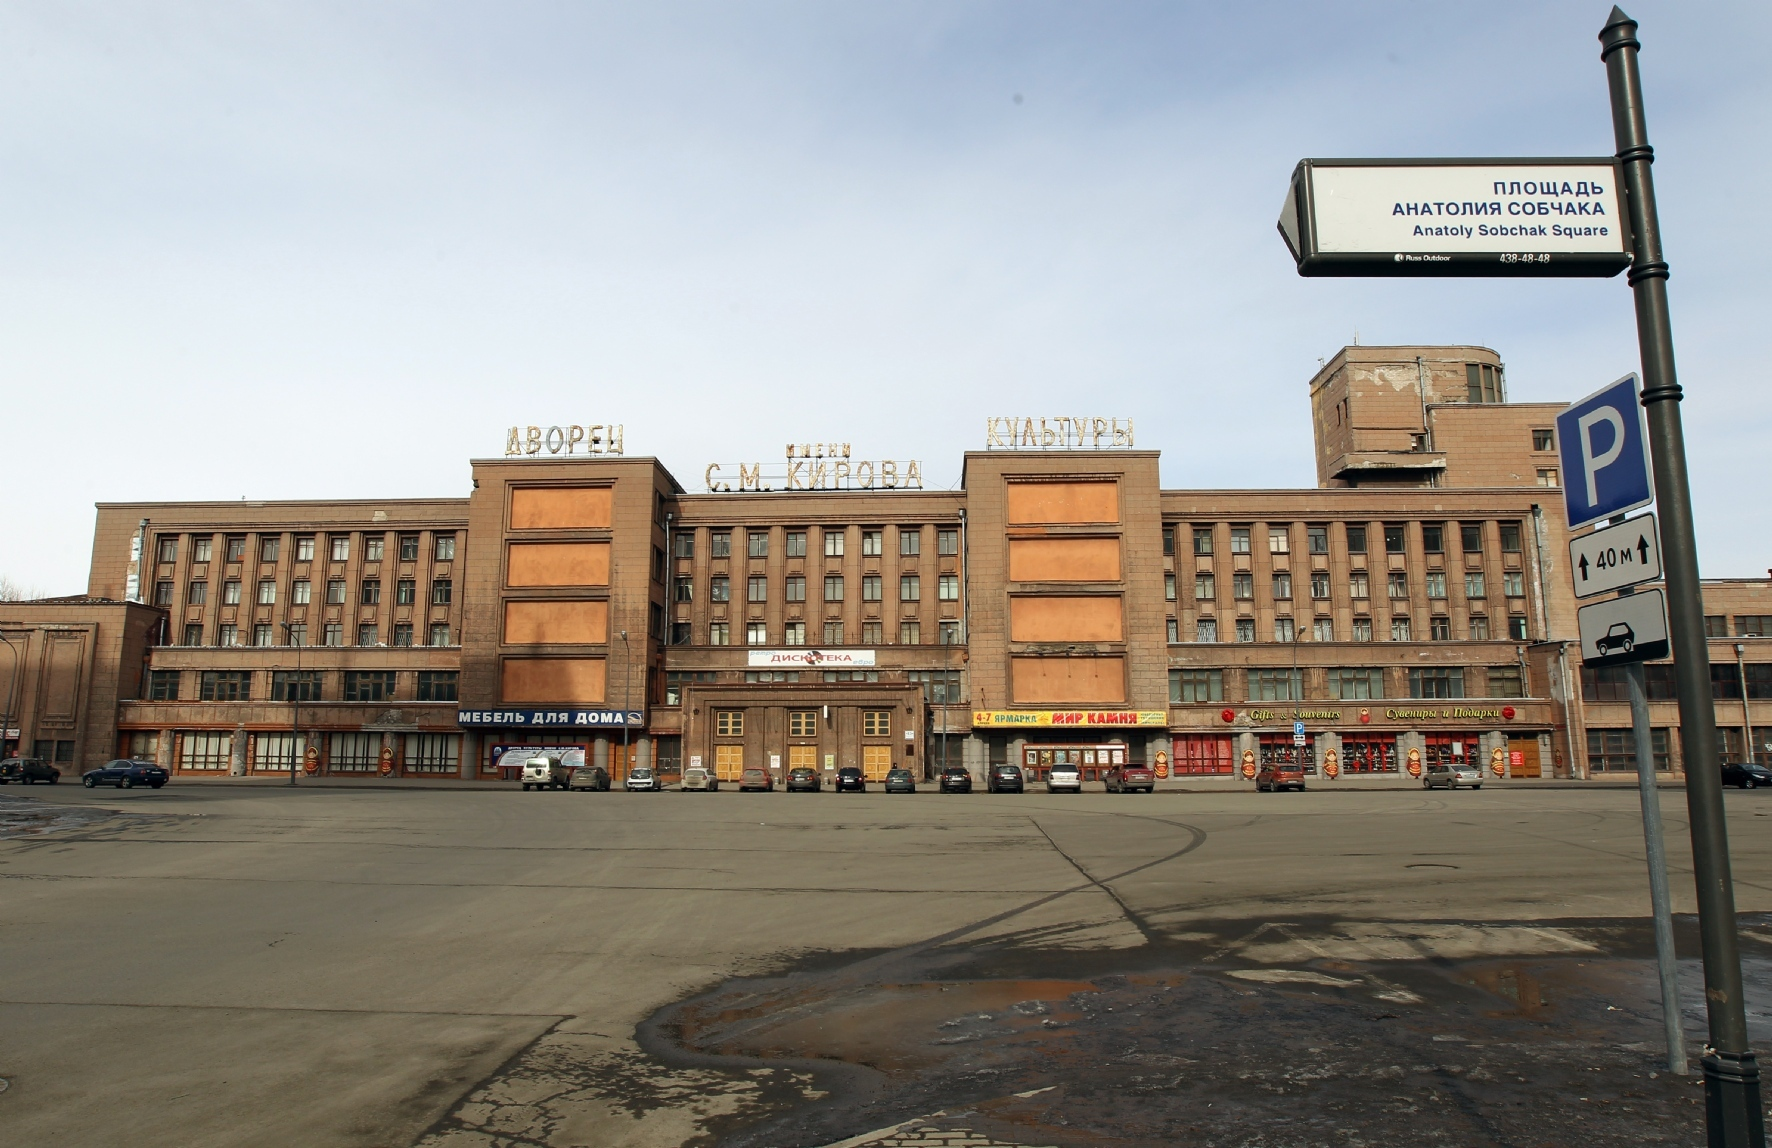 Здание Дворца культуры имени С.М. Кирова